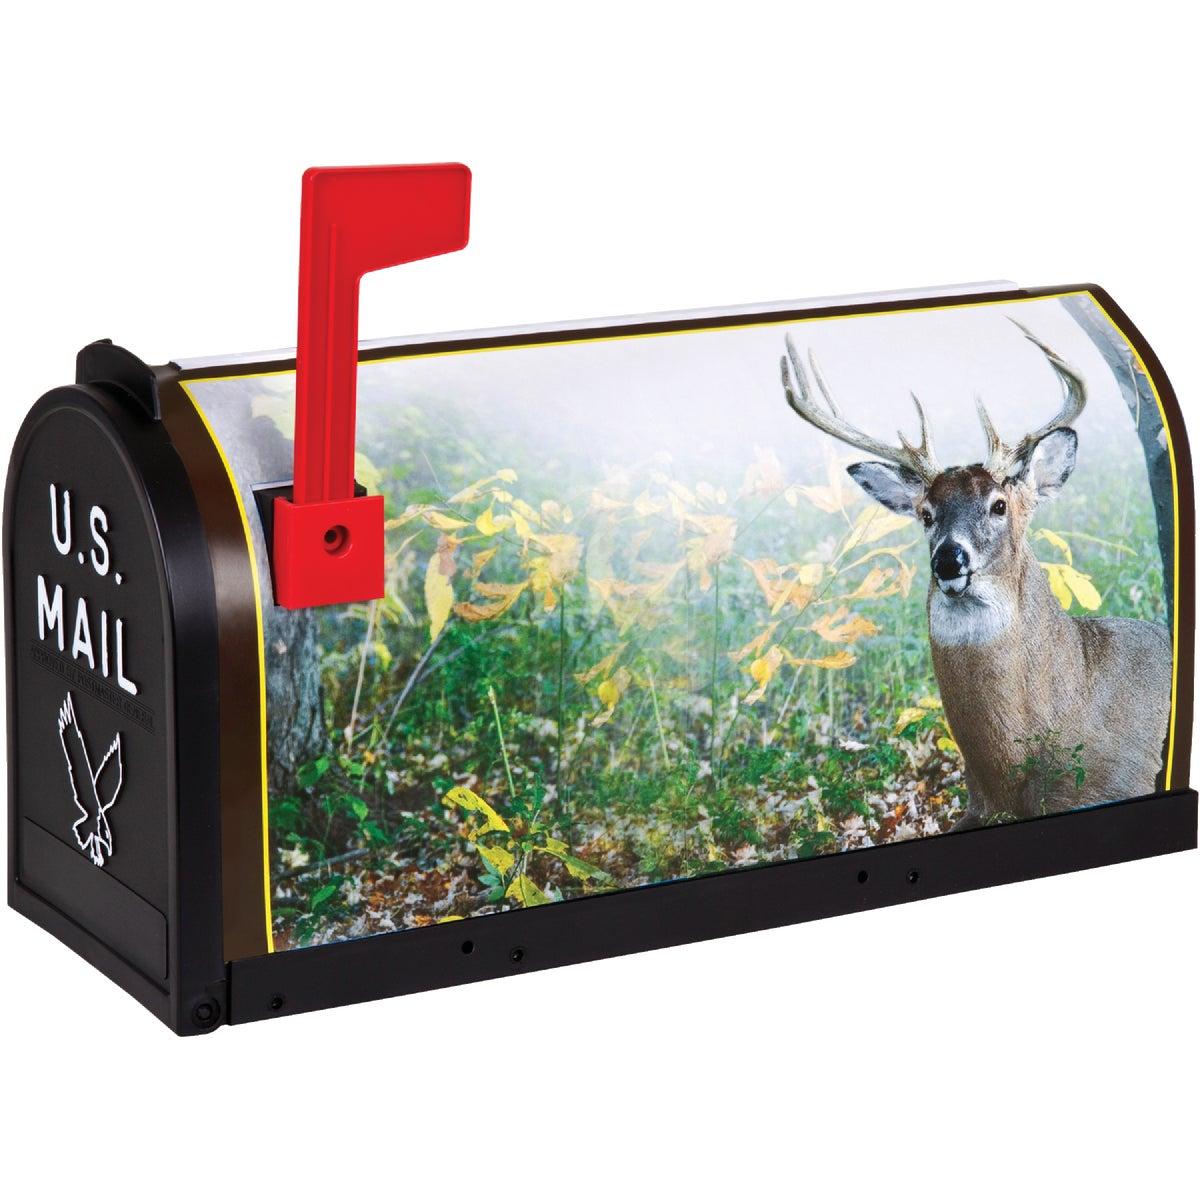 Flambeau T2 Deer Decorative Post Mount Mailbox